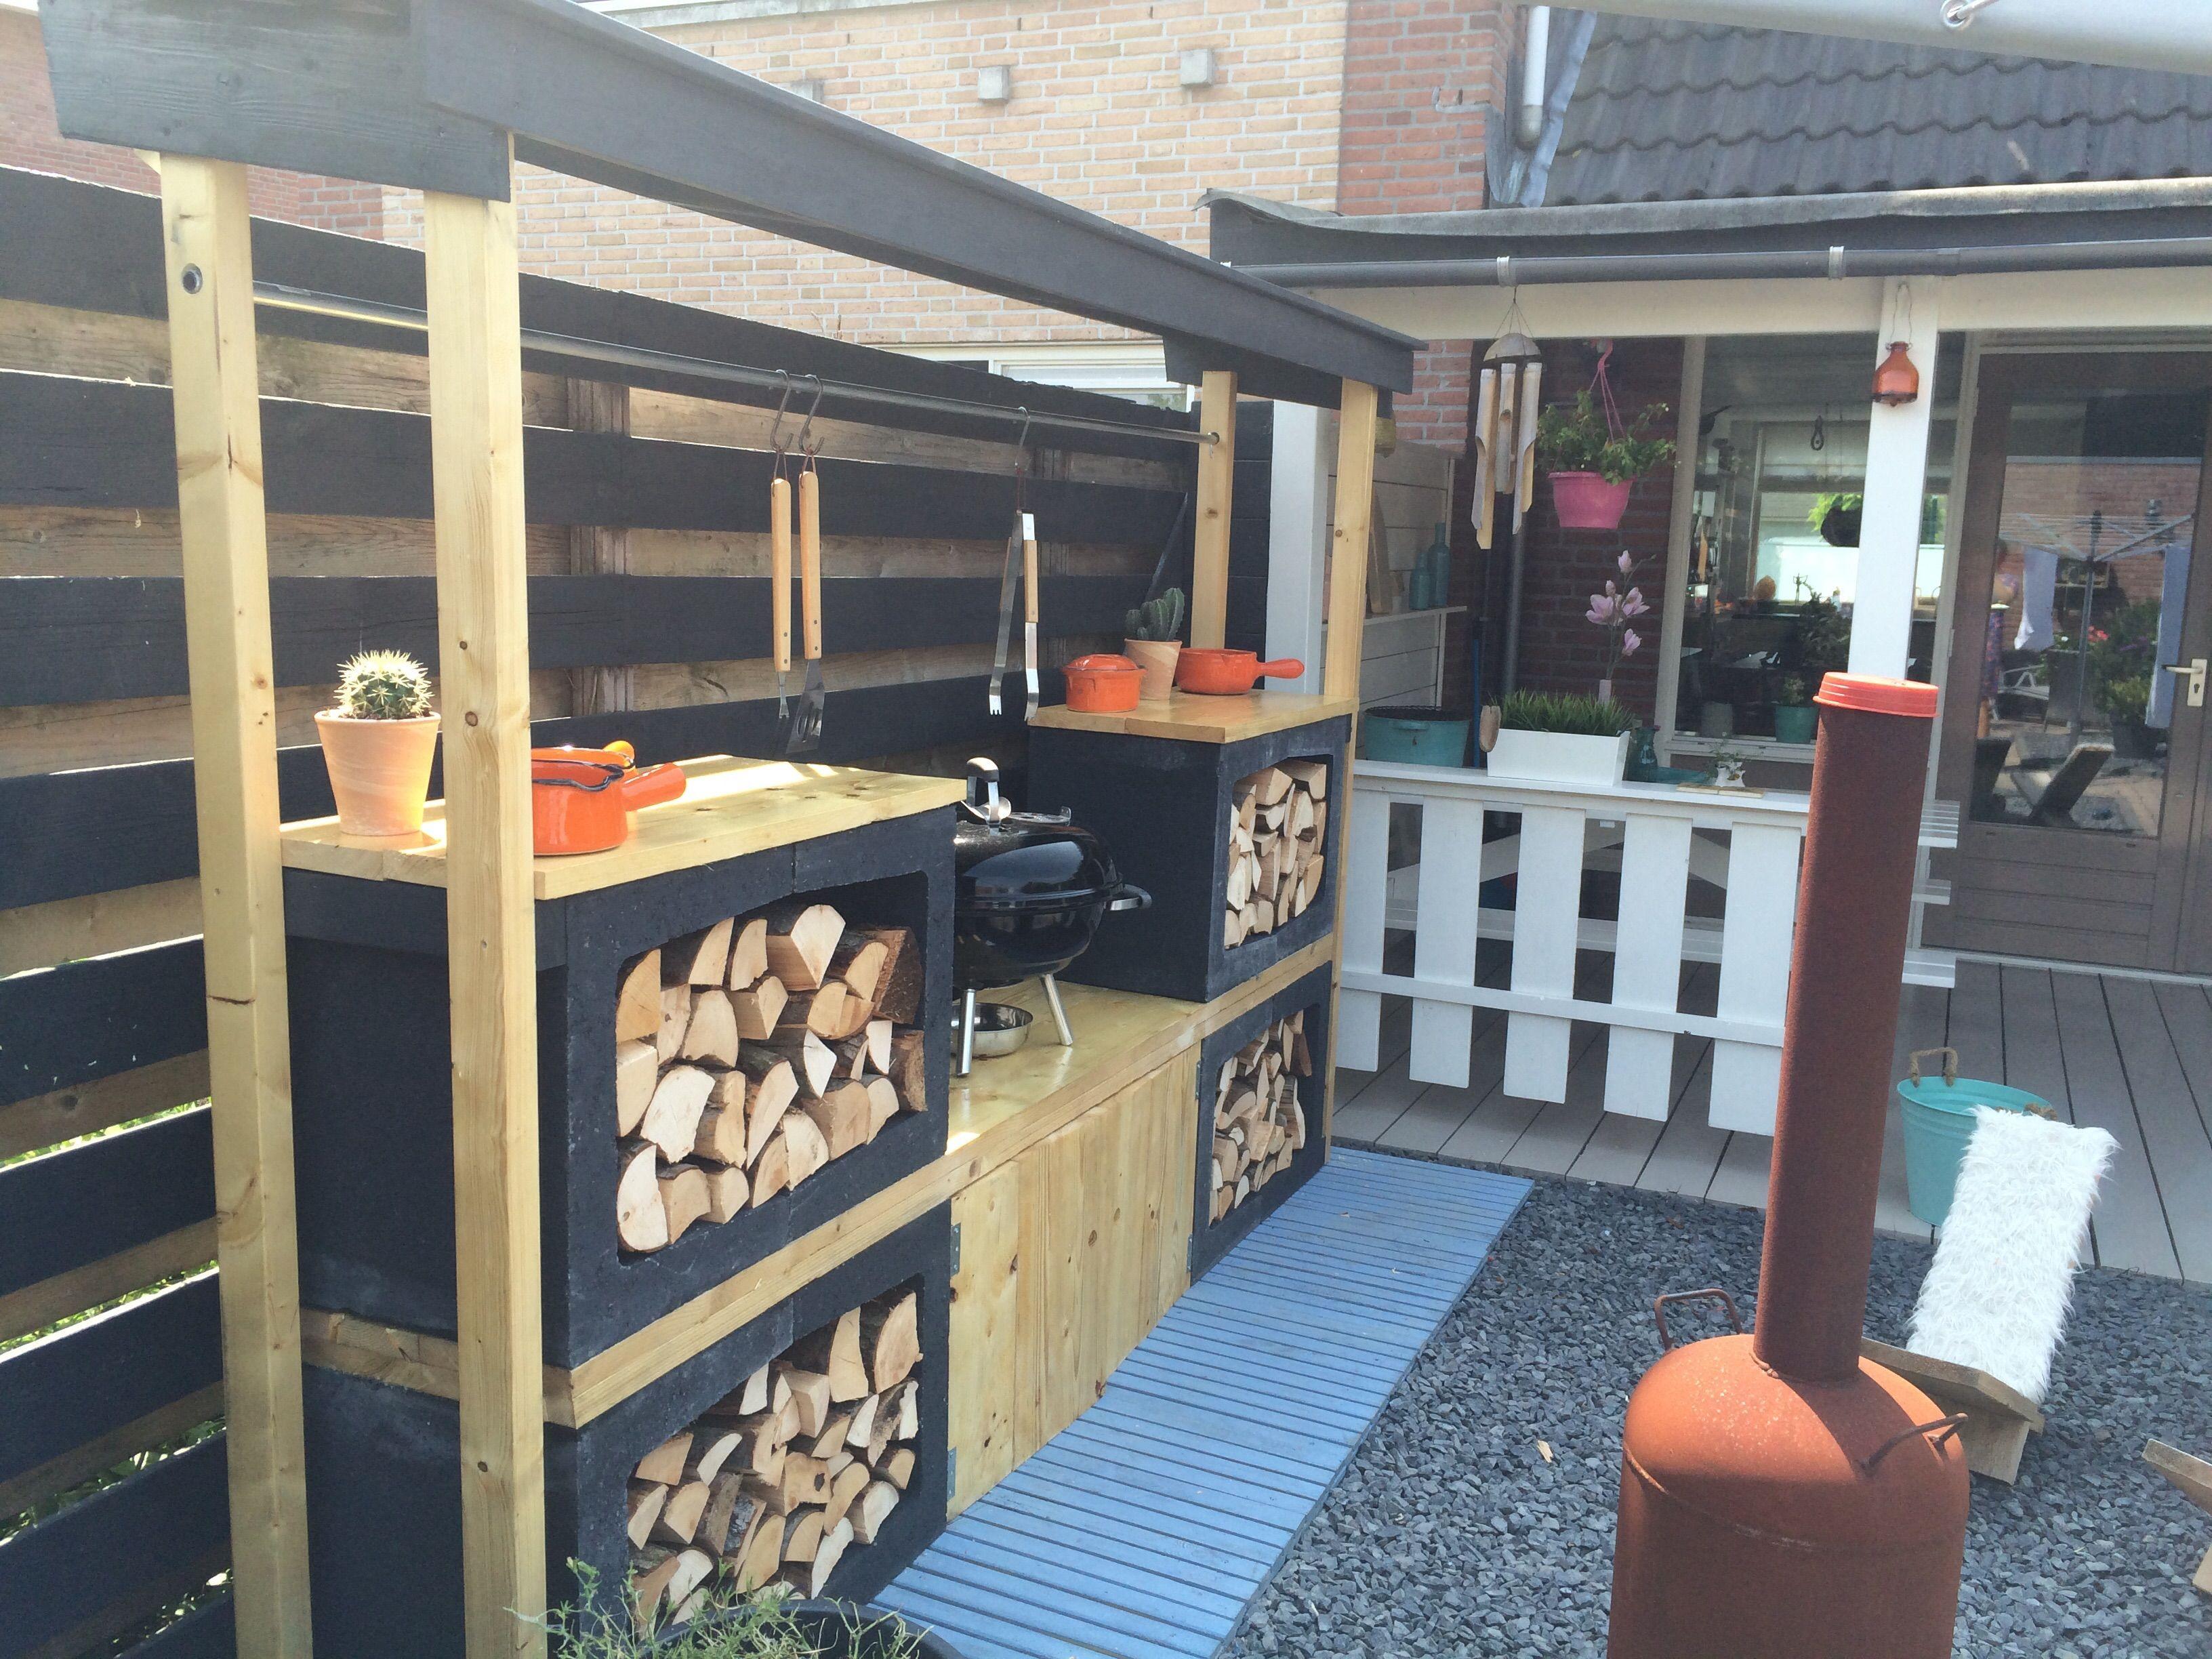 buitenkeuken maken eigen huis en tuin google zoeken buitenkeuken pinterest huis en tuin. Black Bedroom Furniture Sets. Home Design Ideas